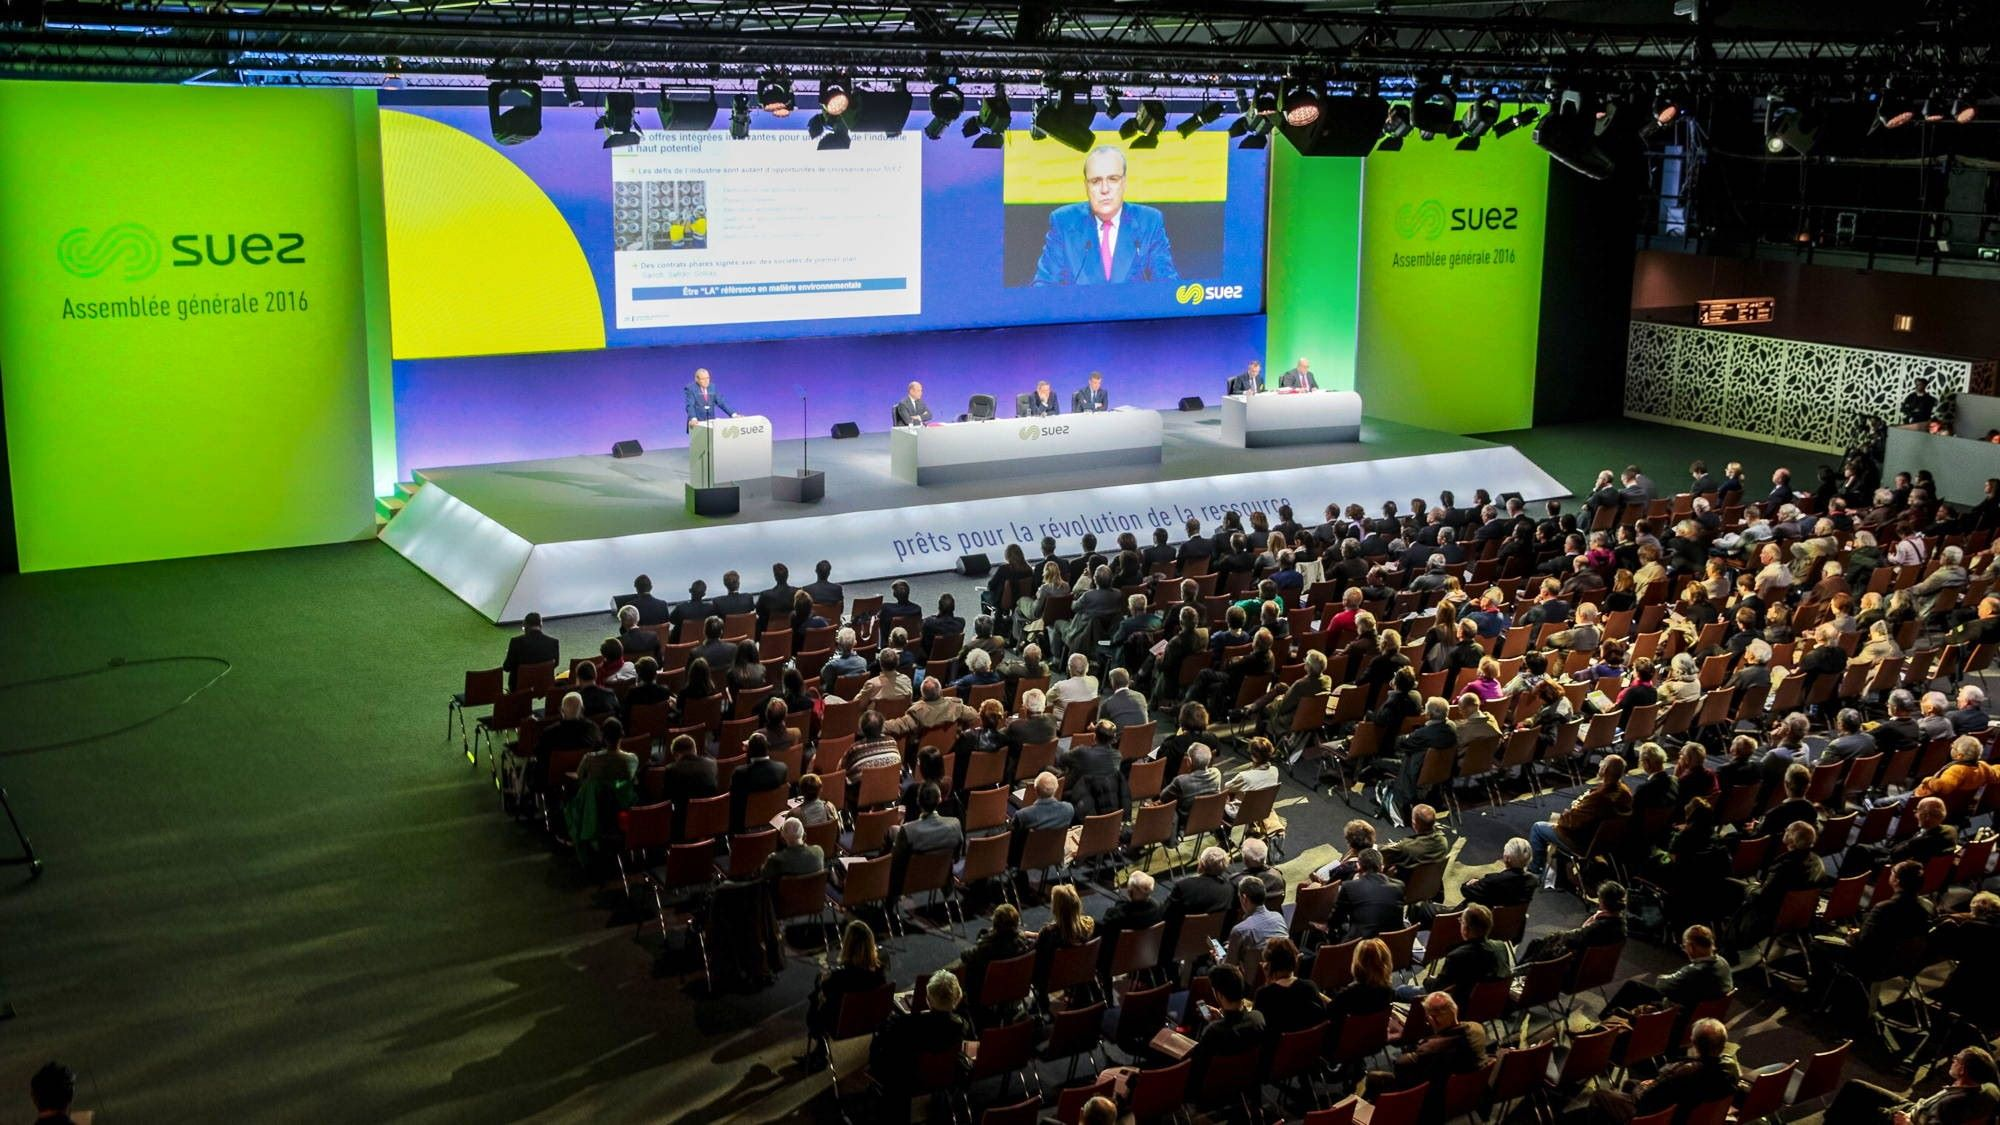 Suez annual general meetings individual shareholders